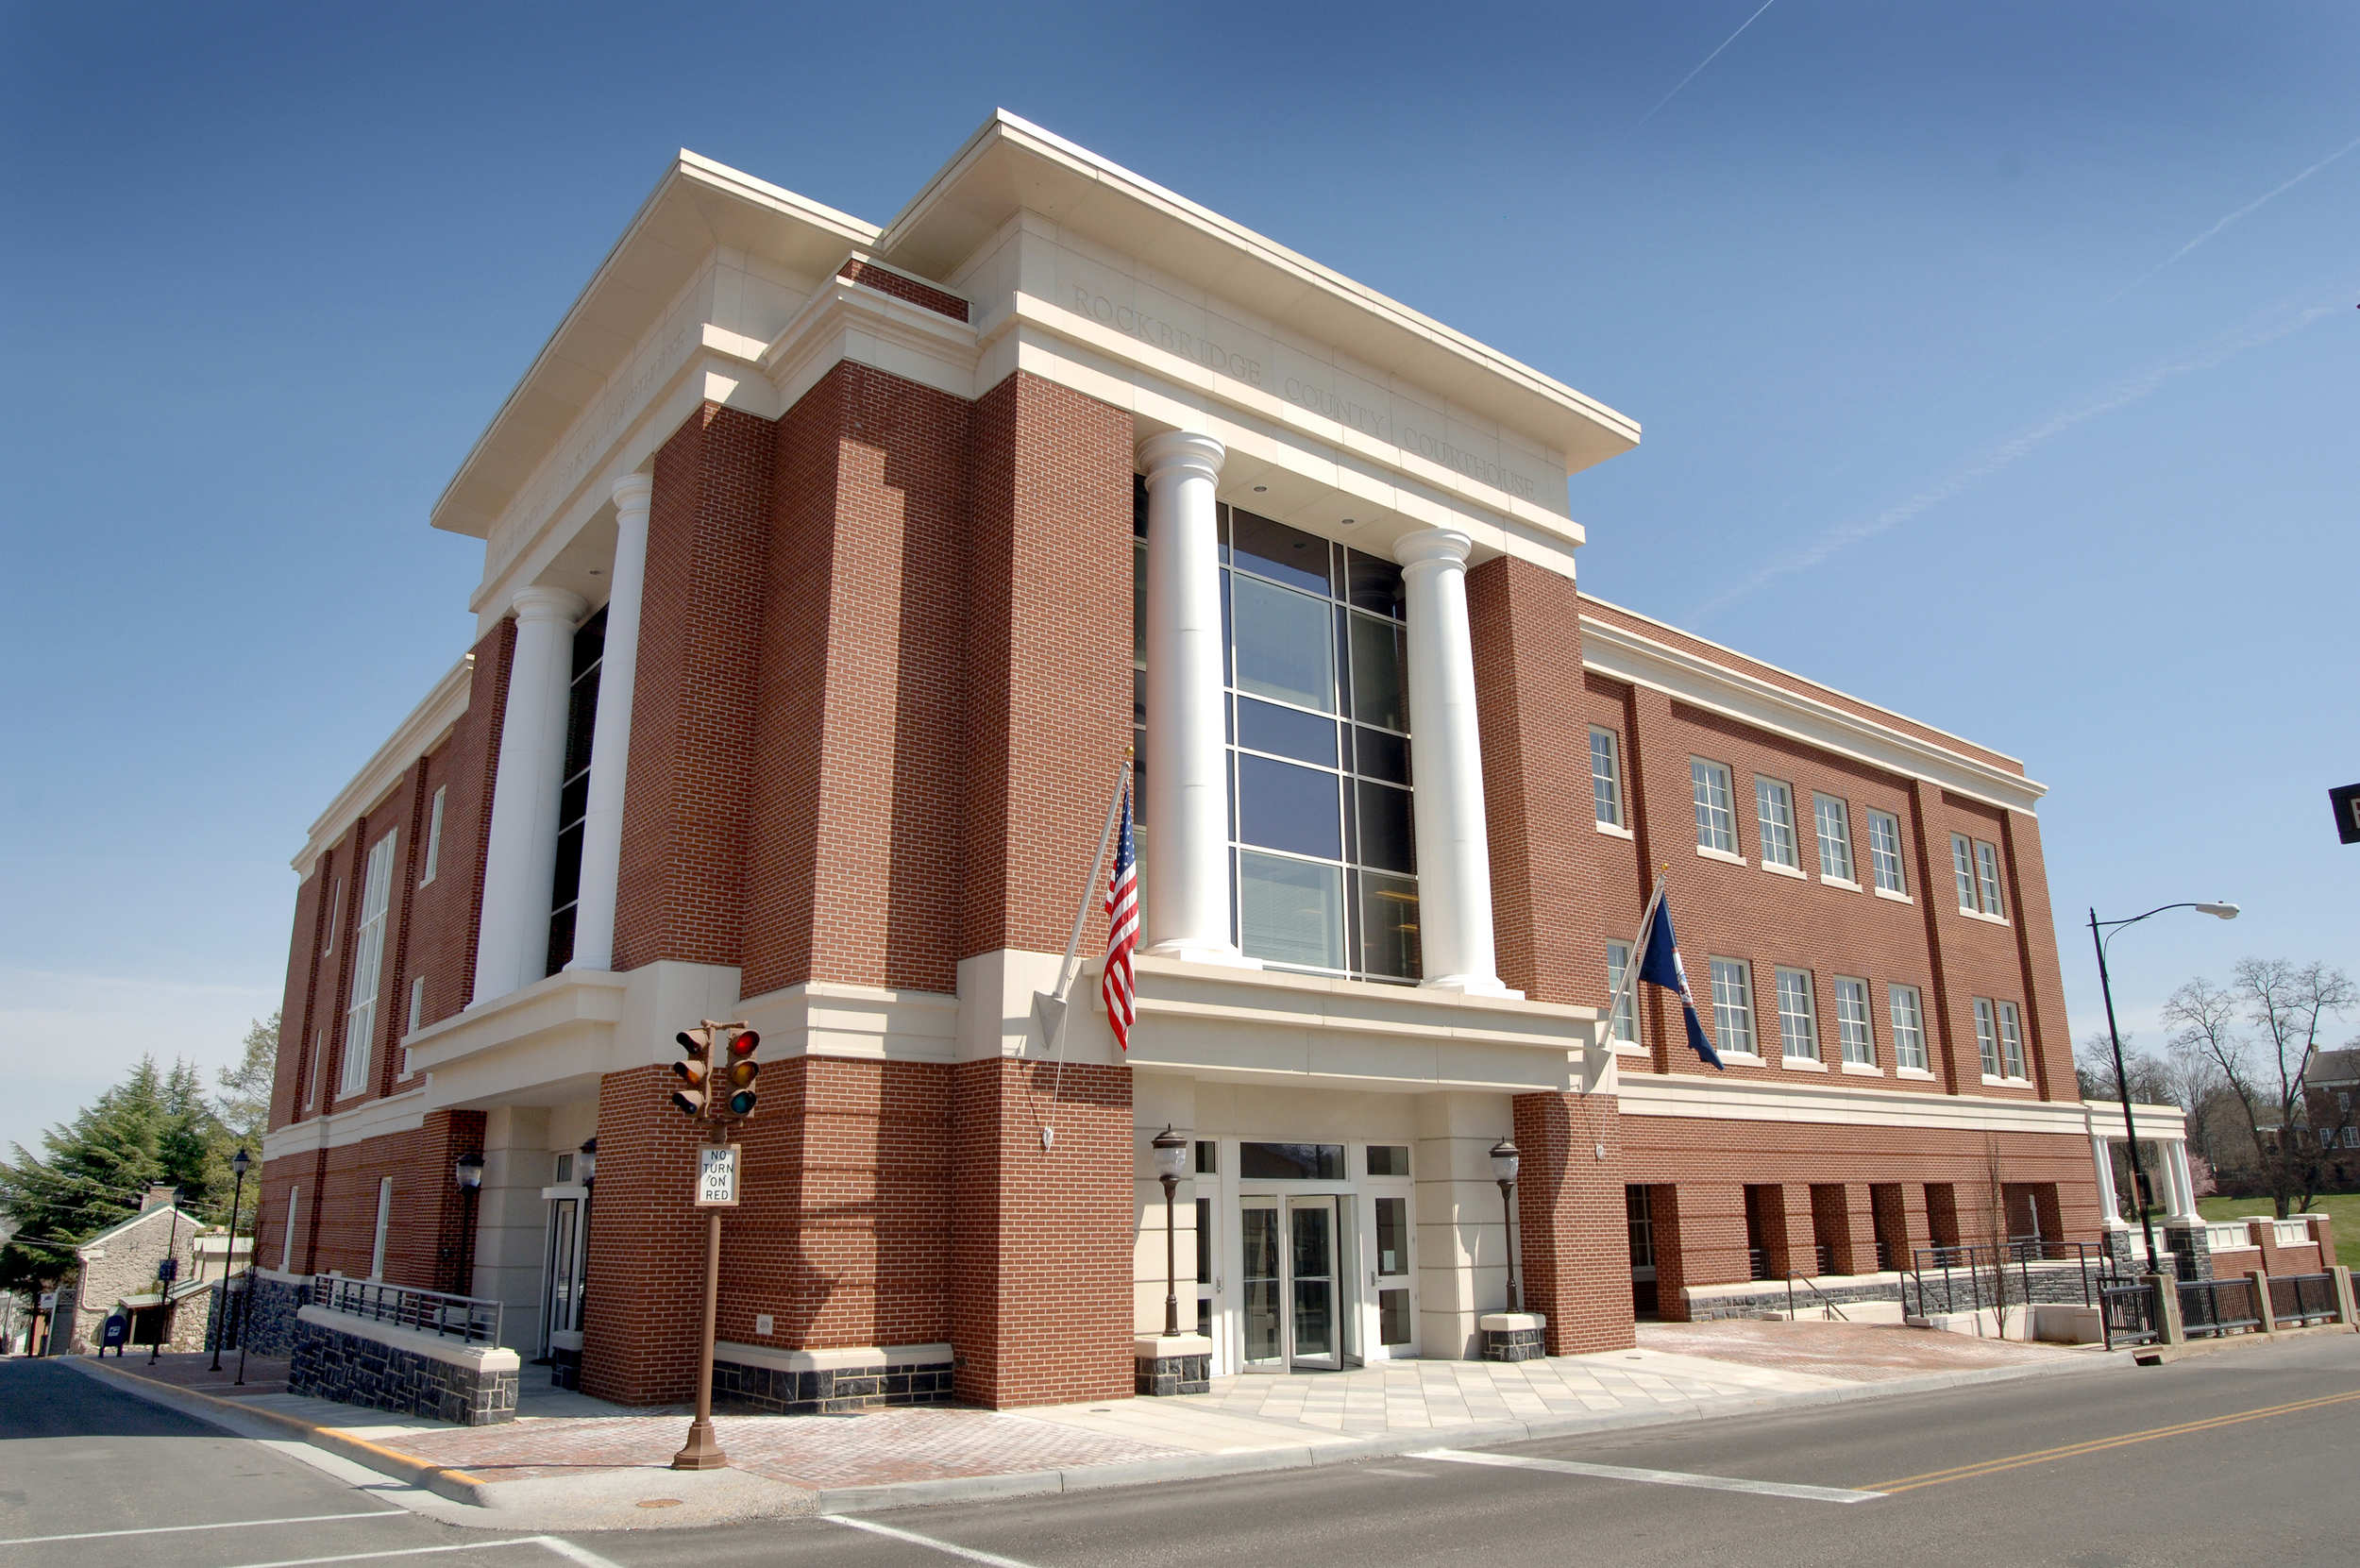 Rockbridge County Courthouse Exterior